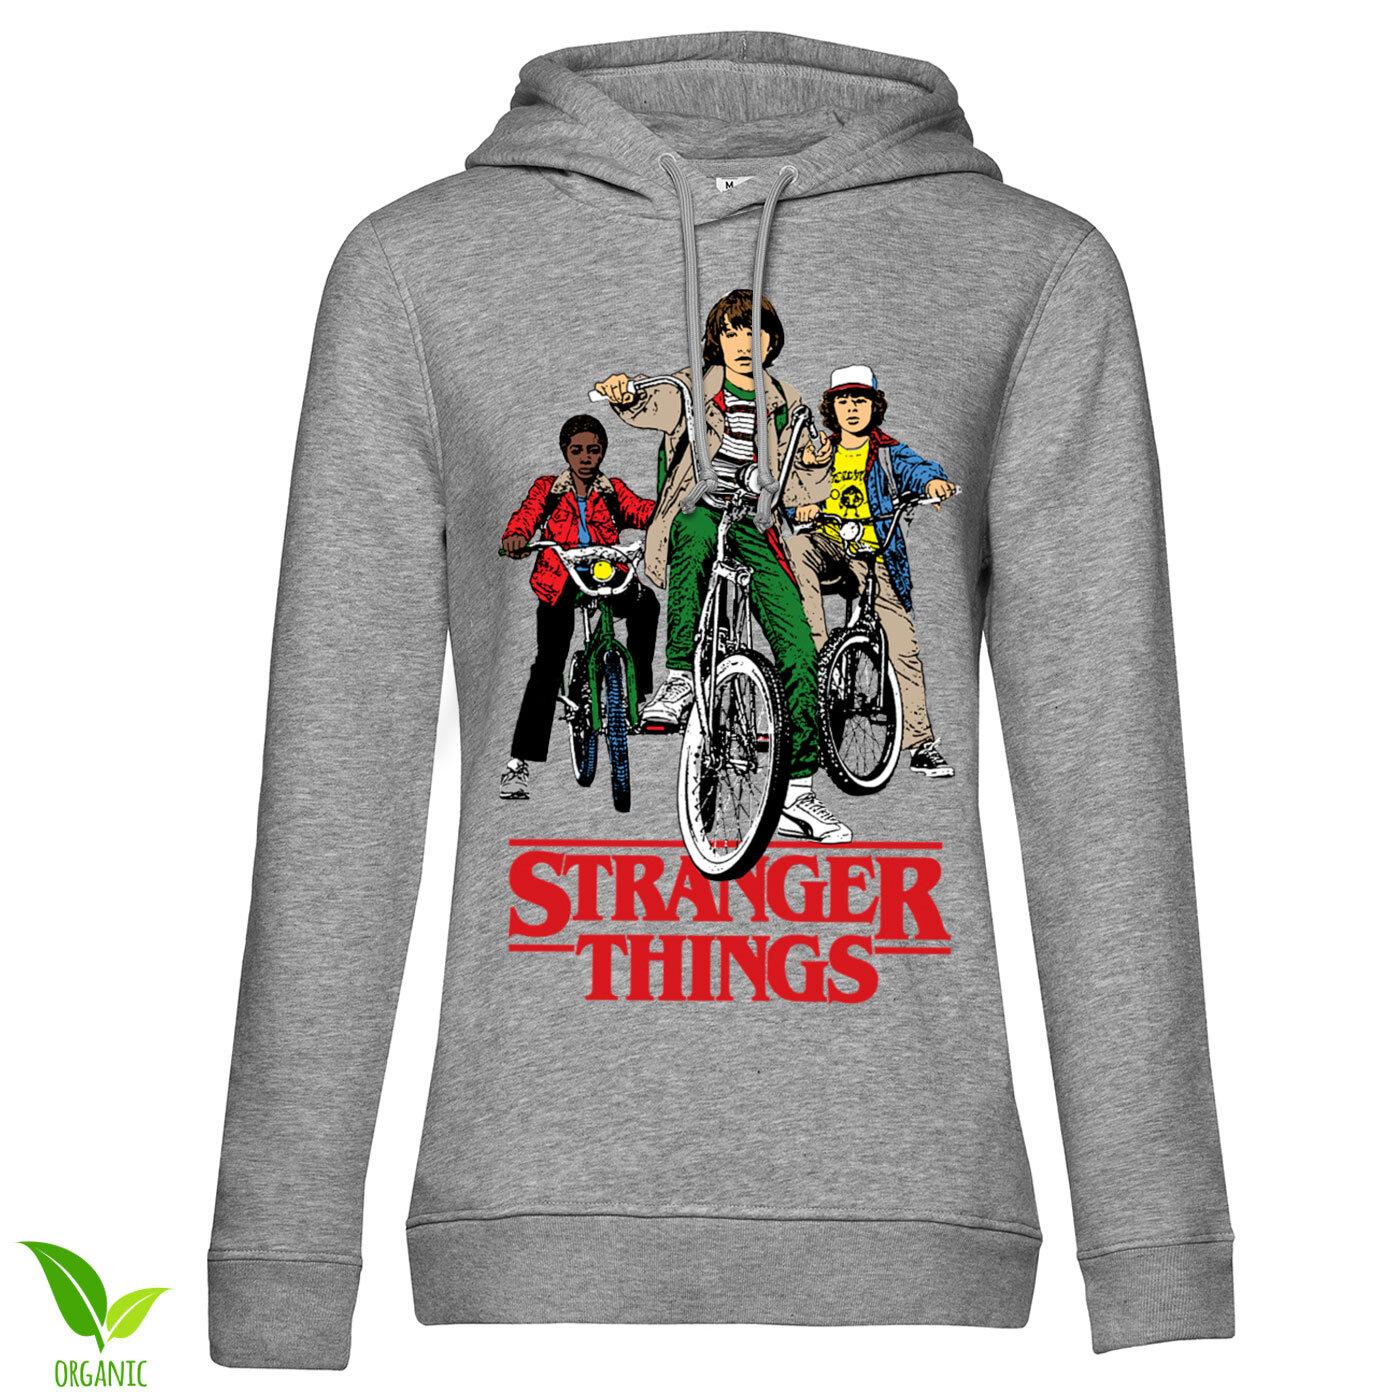 Stranger Things Bikes Girls Hoodie